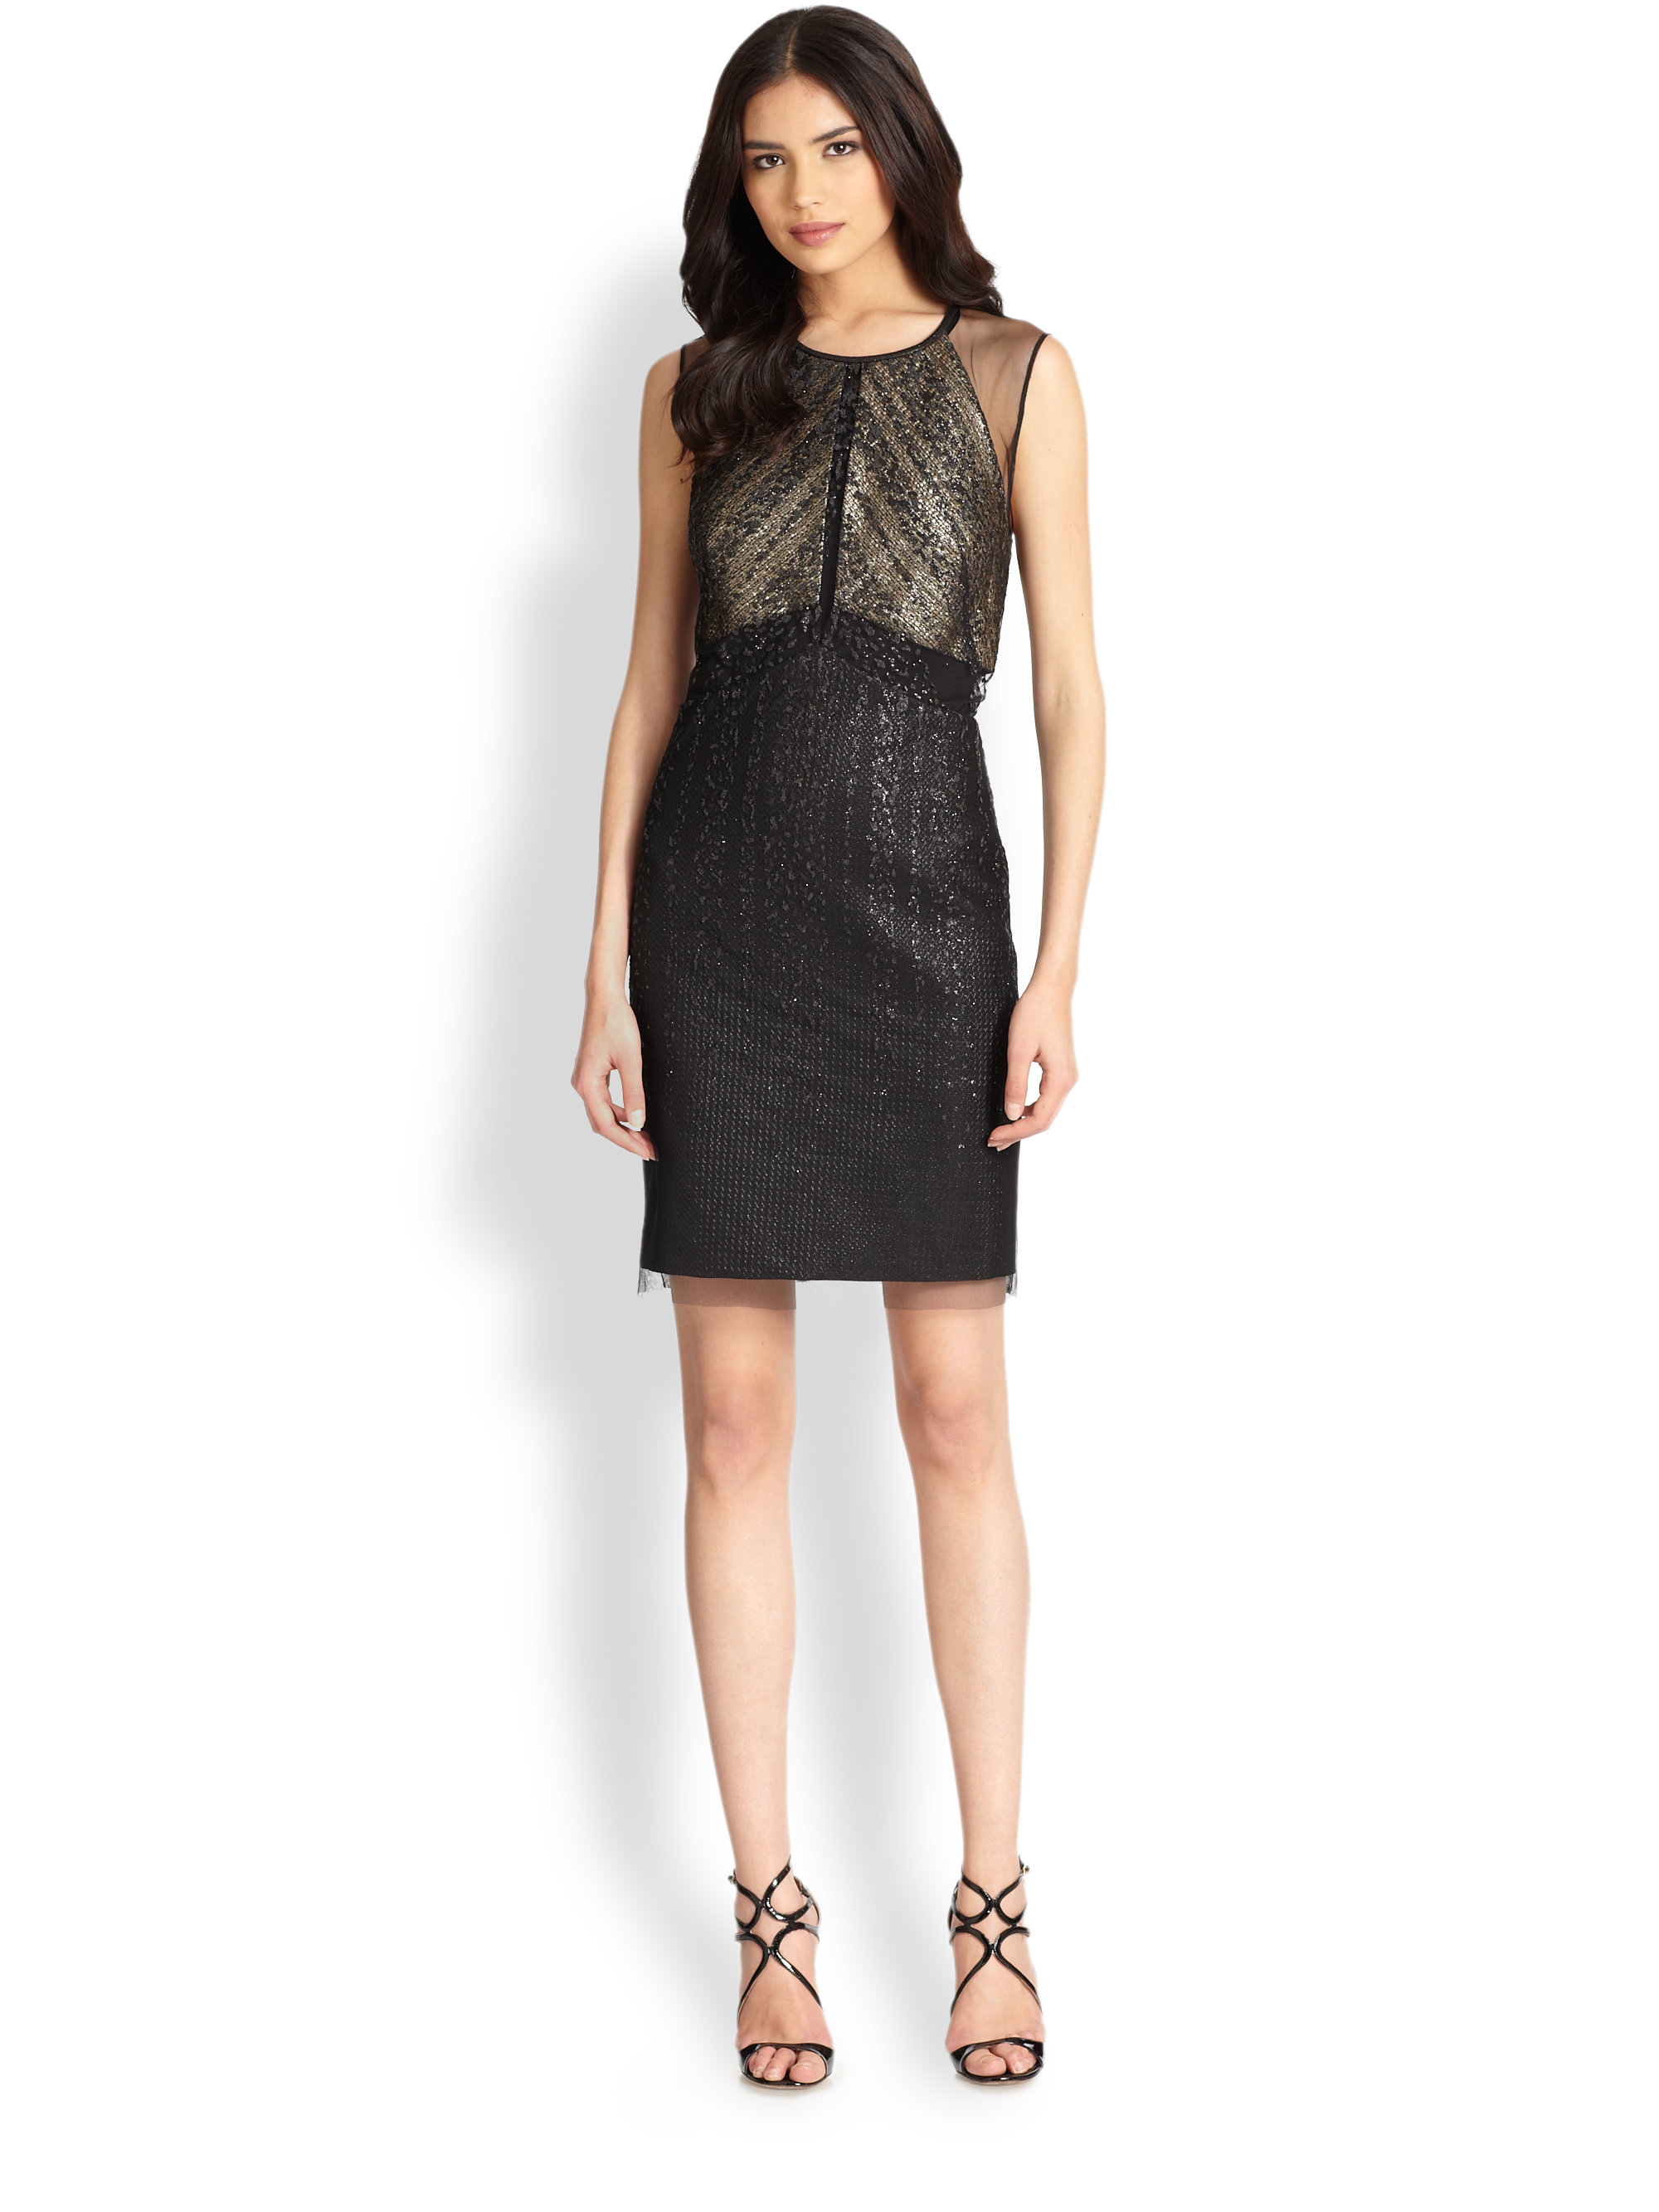 Lyst - Kay Unger Metallic Cocktail Dress in Black